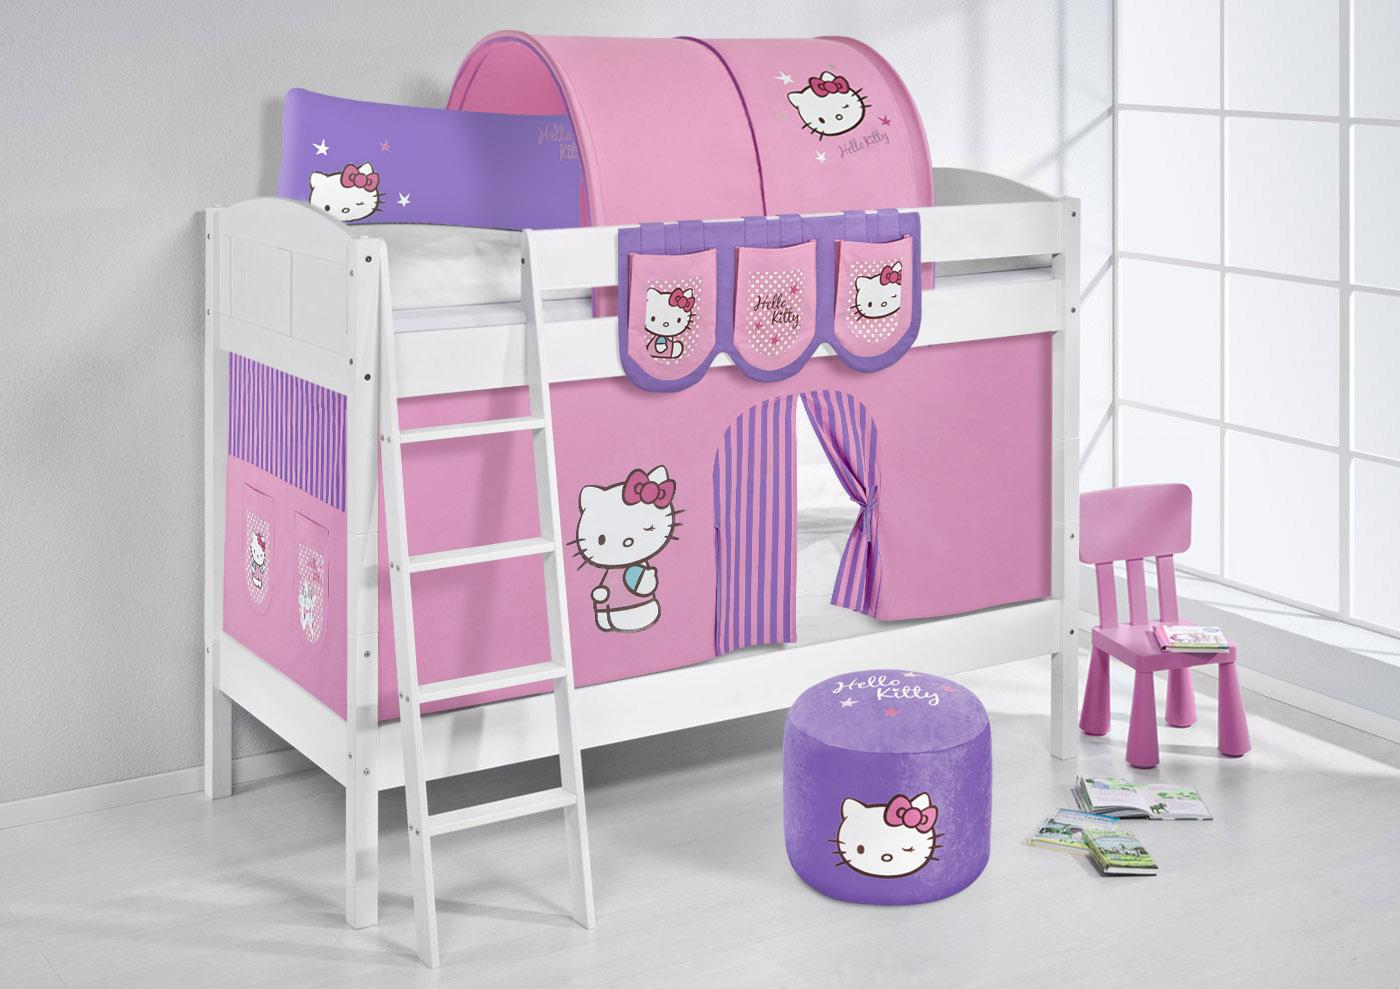 Vorhang Etagenbett Kinder : Etagenbett hochbett kinder bett aus massiver kiefer ida 4106 weiß